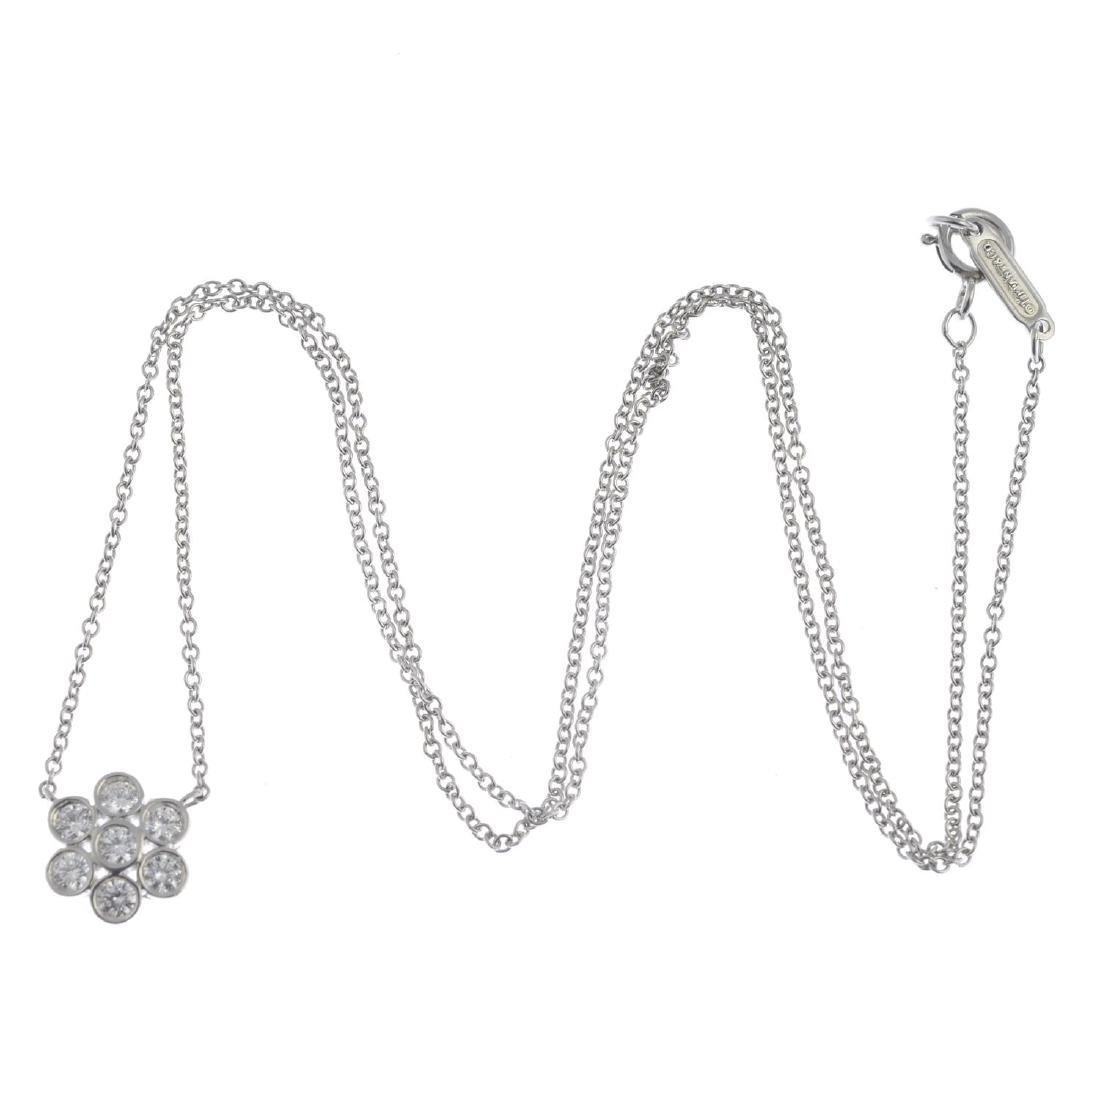 TIFFANY & CO. - a diamond 'Enchant' cluster necklace. - 3